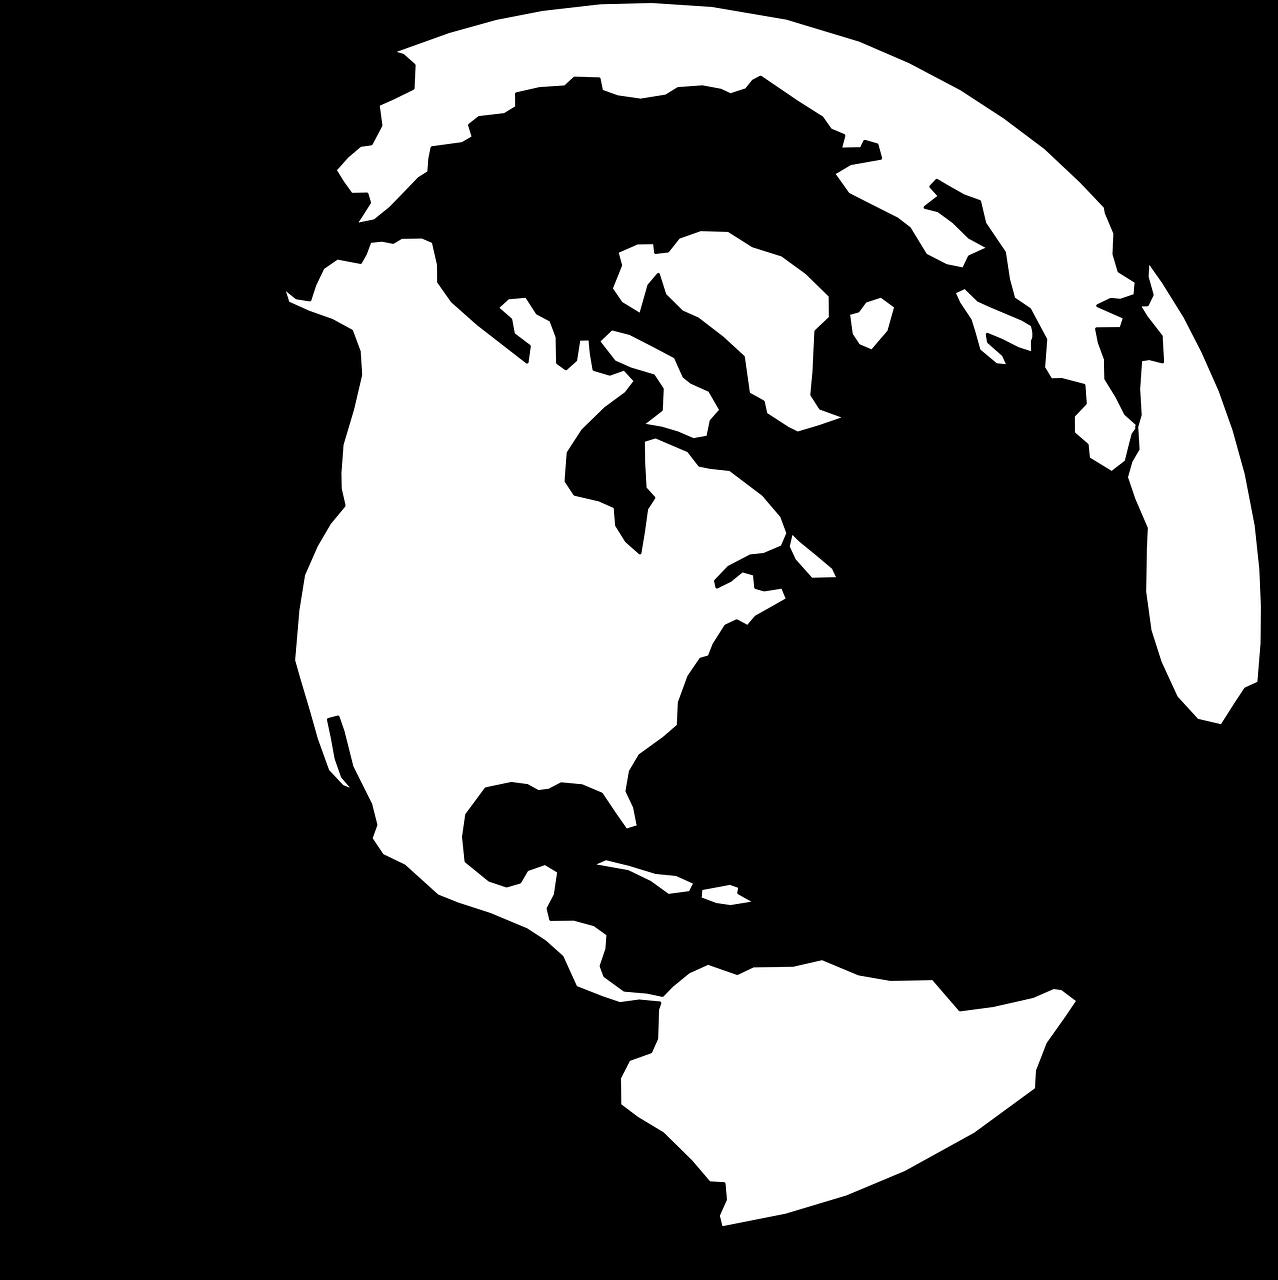 Globe clipart cliaprt. Earth transparent silhouette